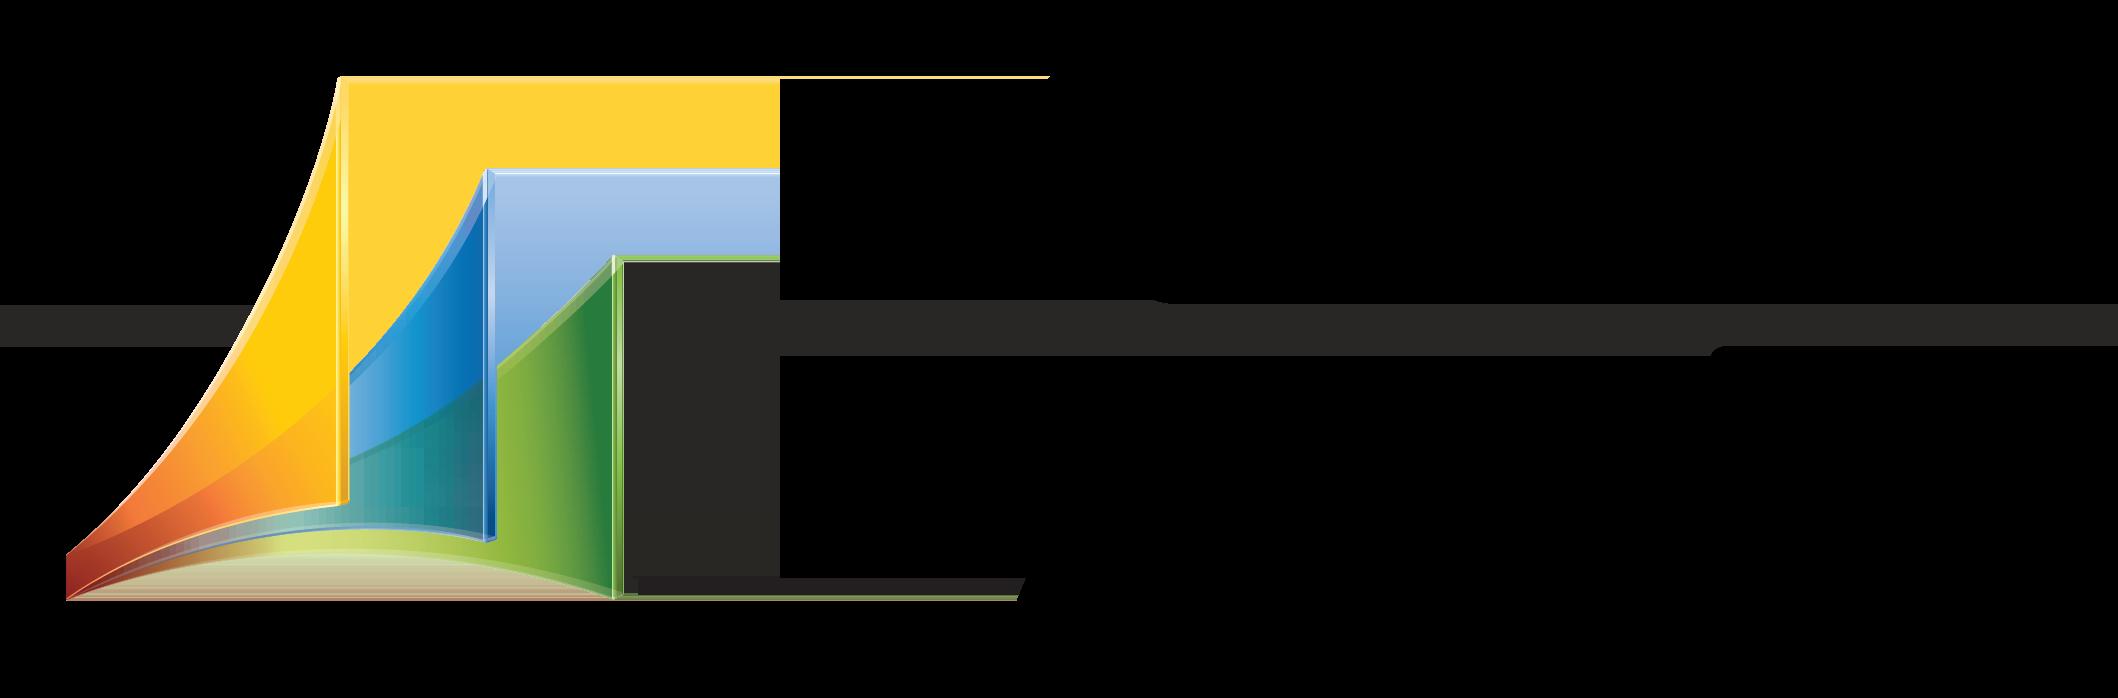 msdynamics-logo.png